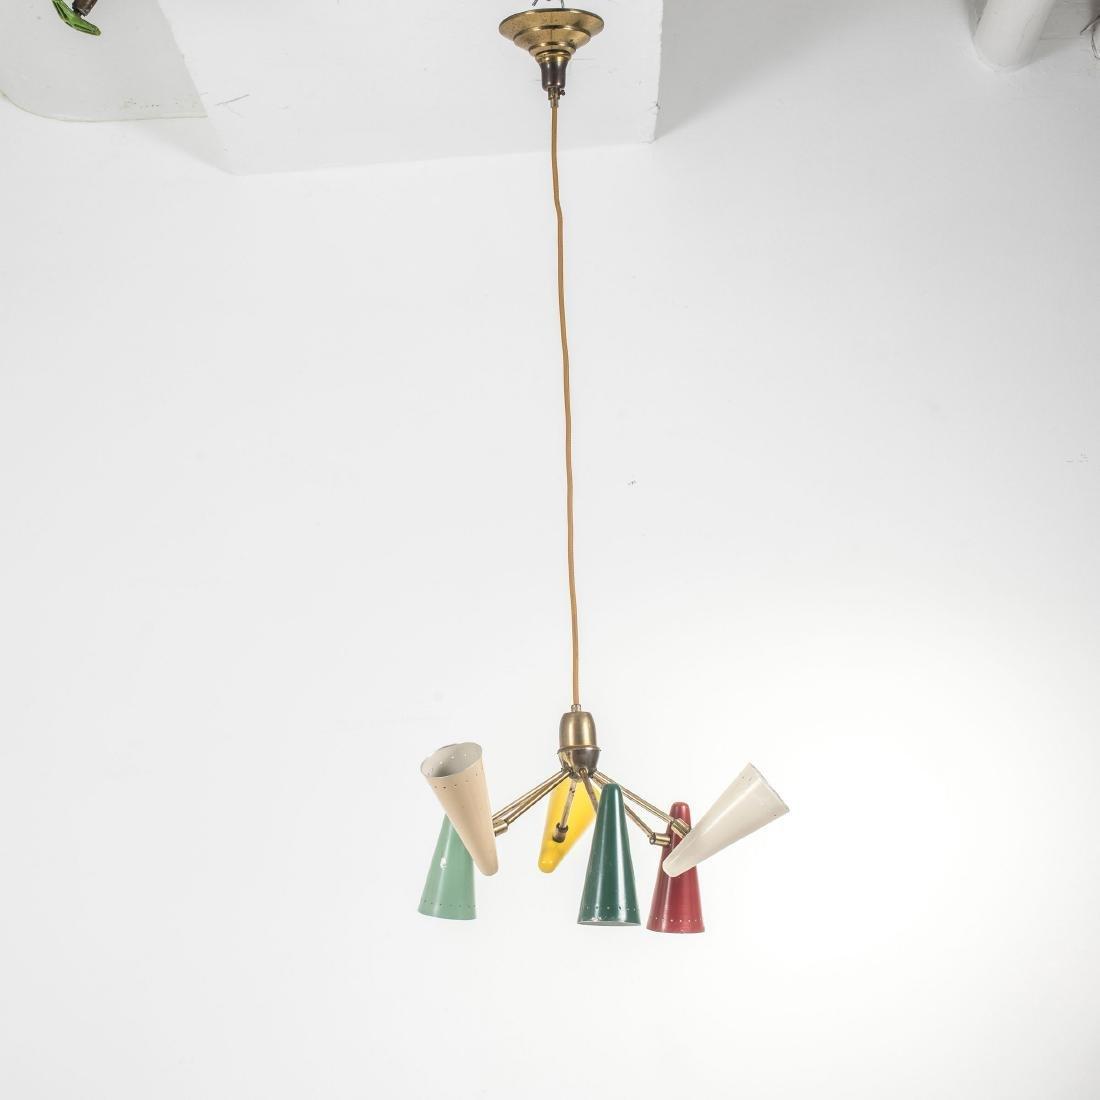 Ceiling light, c. 1954 - 3